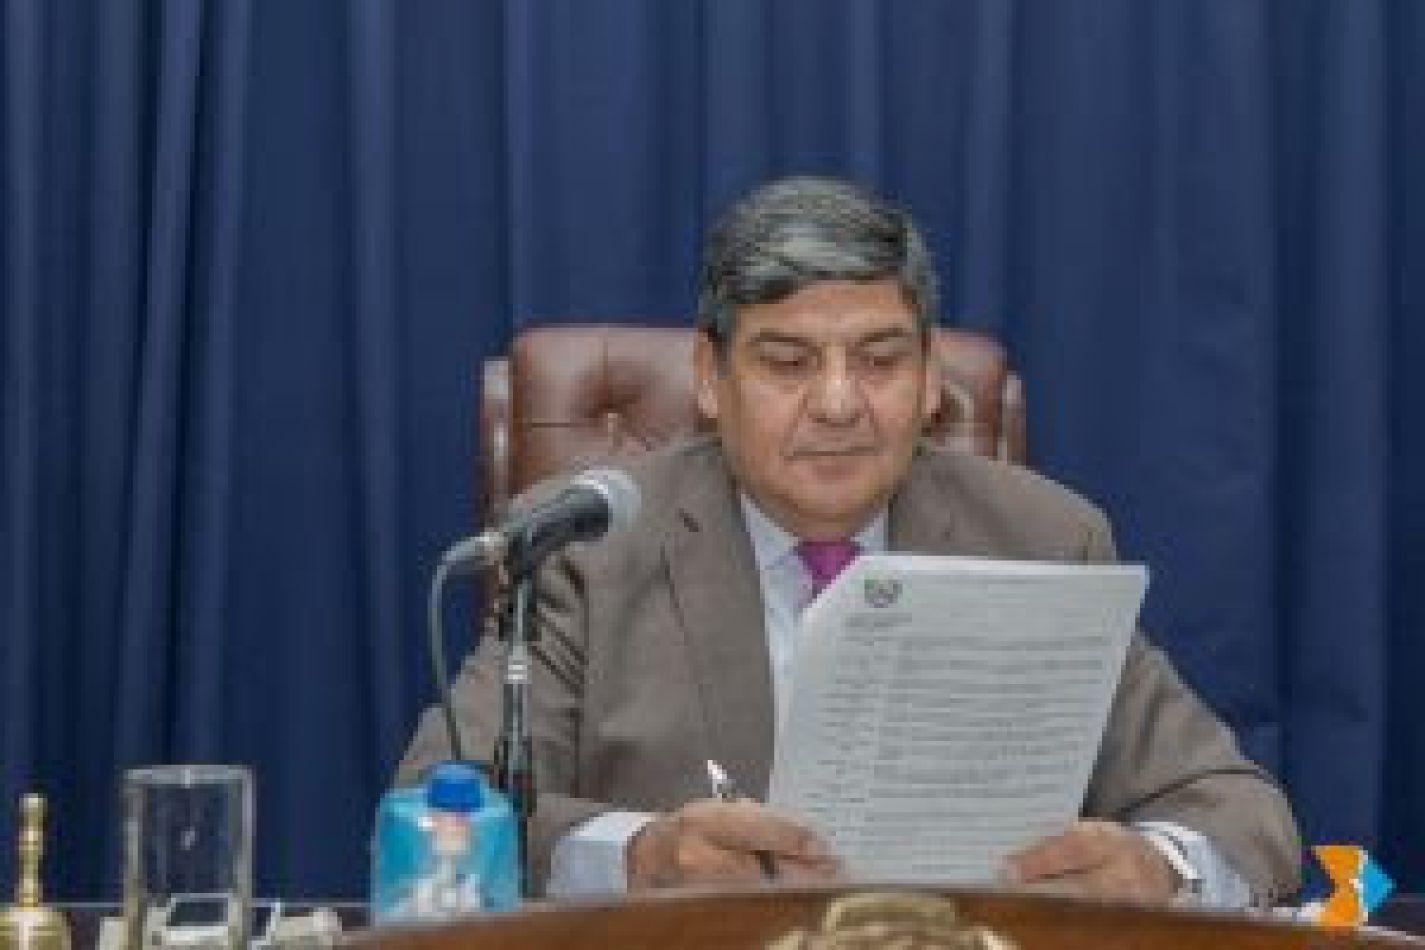 El titular del Parlamento, vicegobernador Juan Carlos Arcando